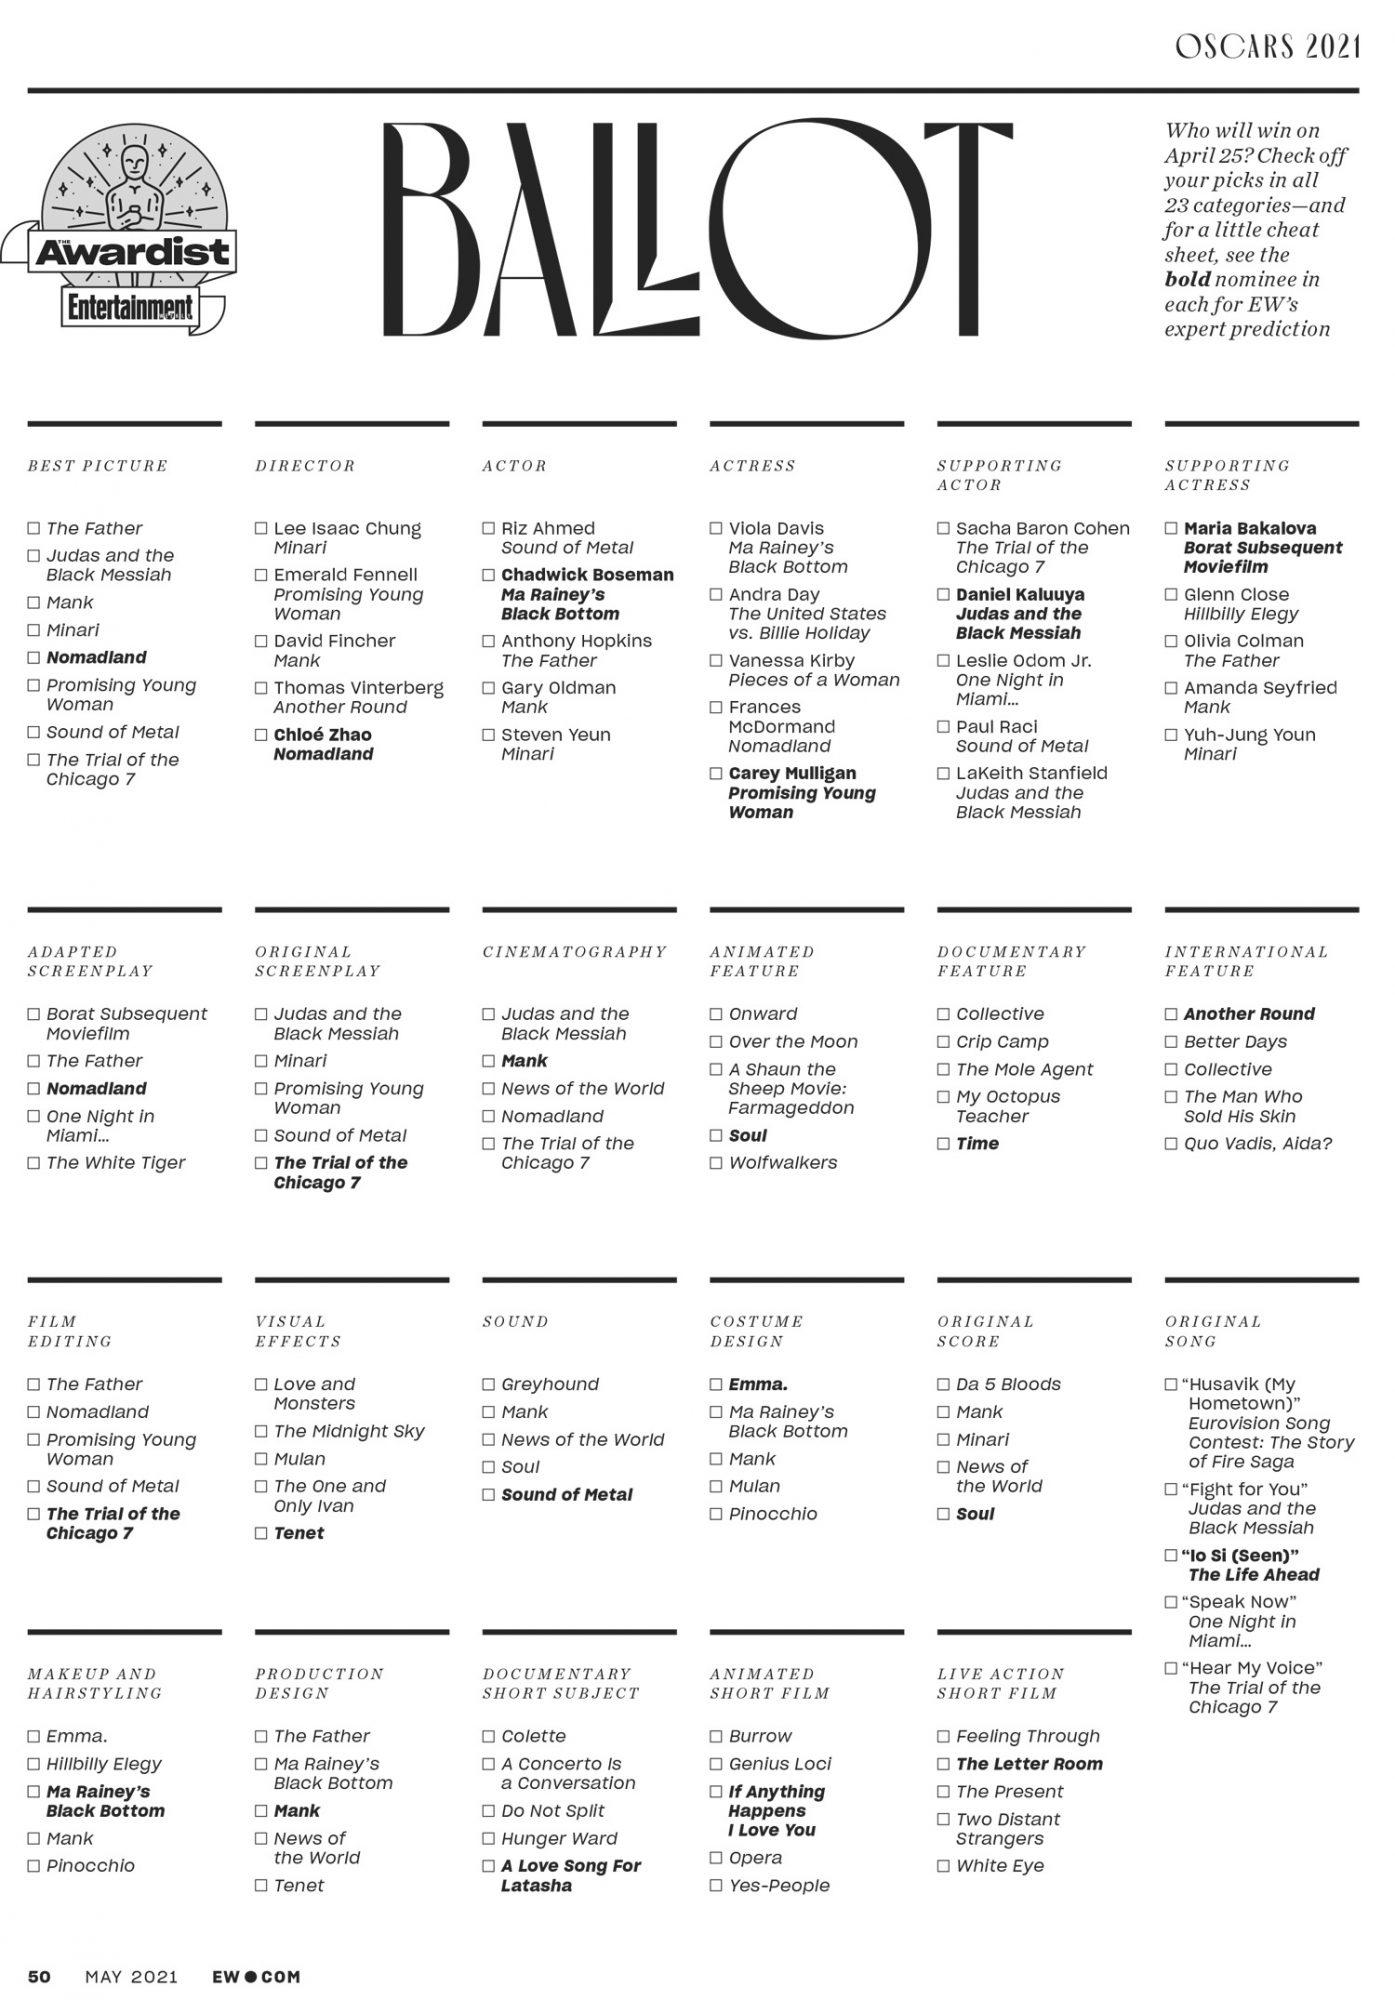 Oscars ballot